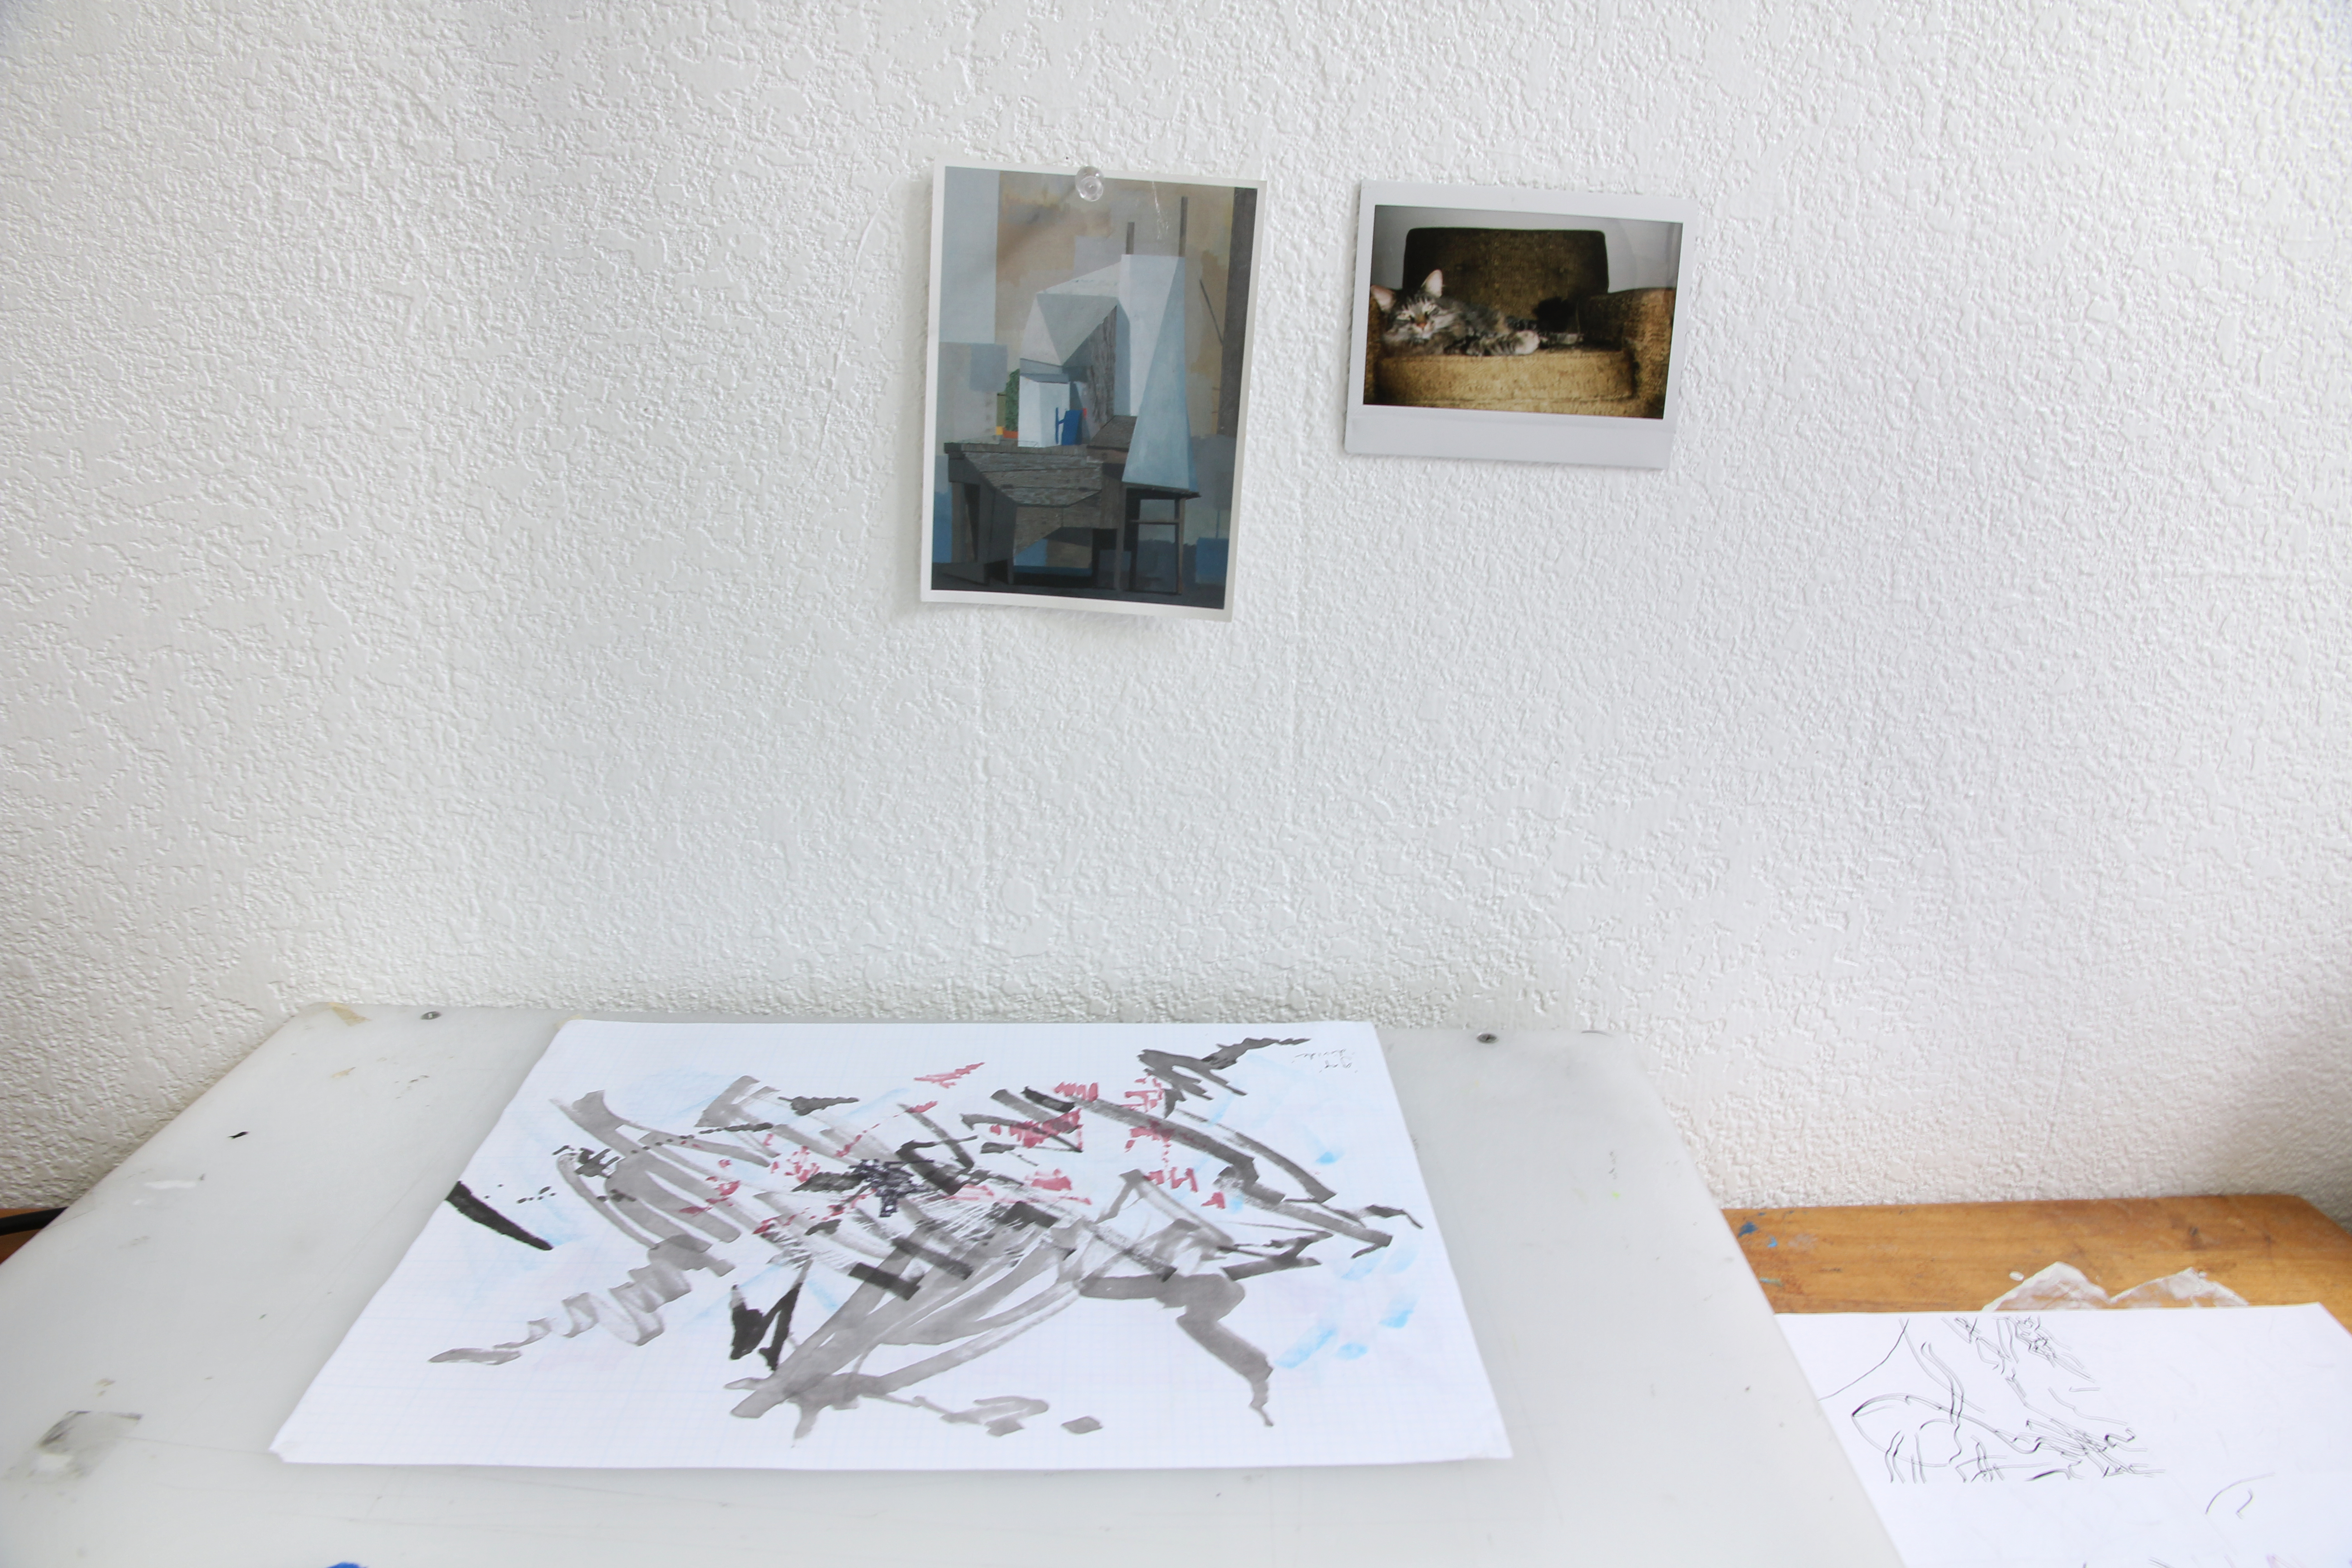 Kate Faulkner, Studio Visit, July 2017